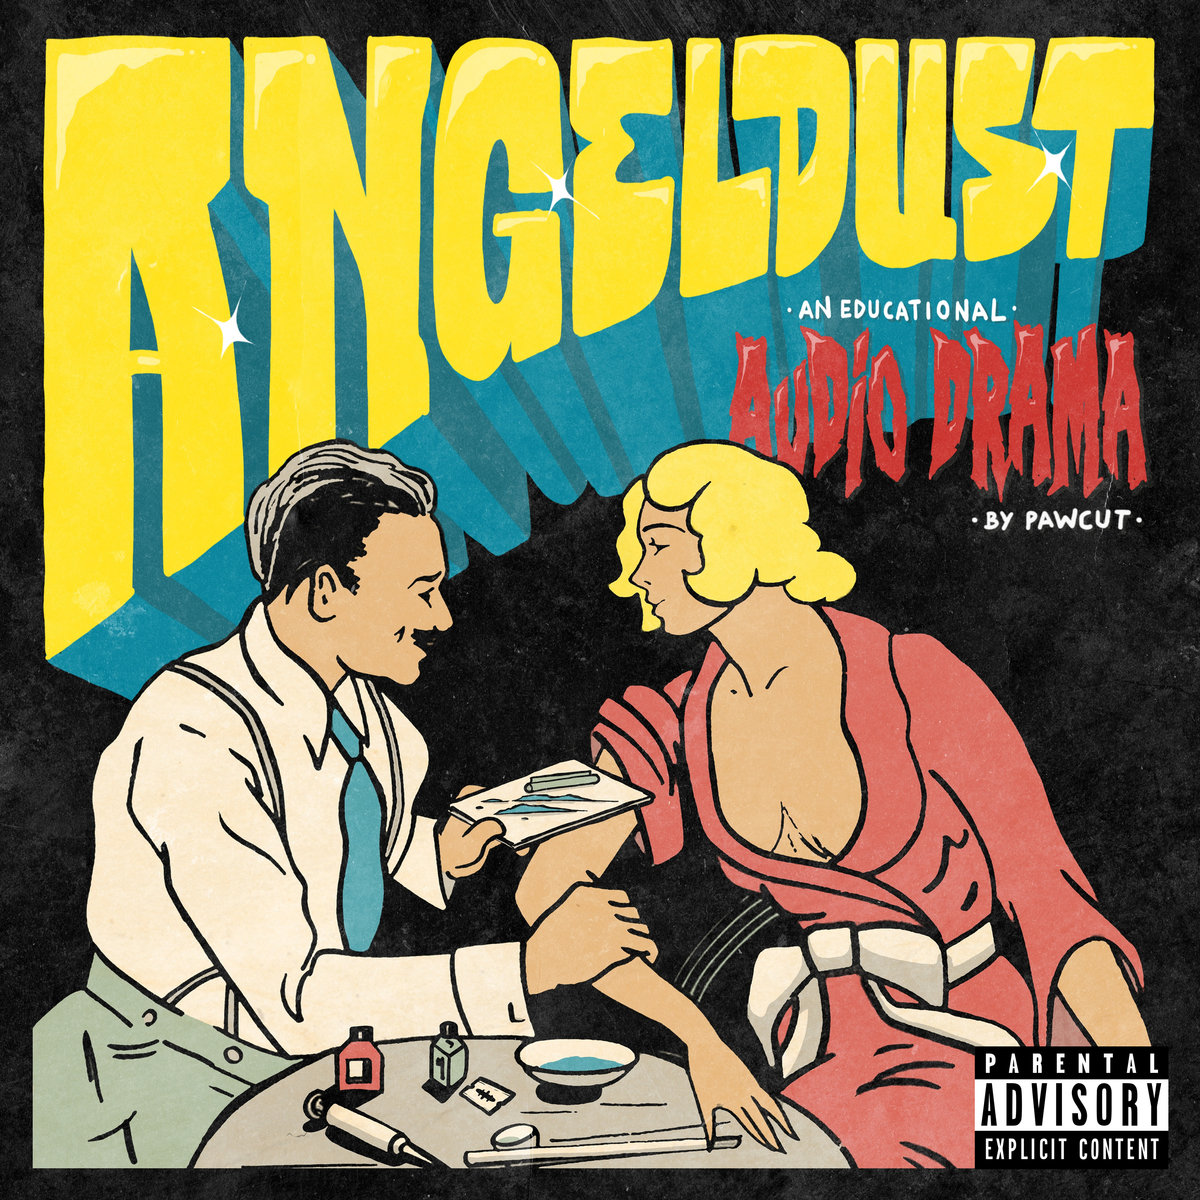 Pawcut – Angel Dust (An Educational AudioDrama)